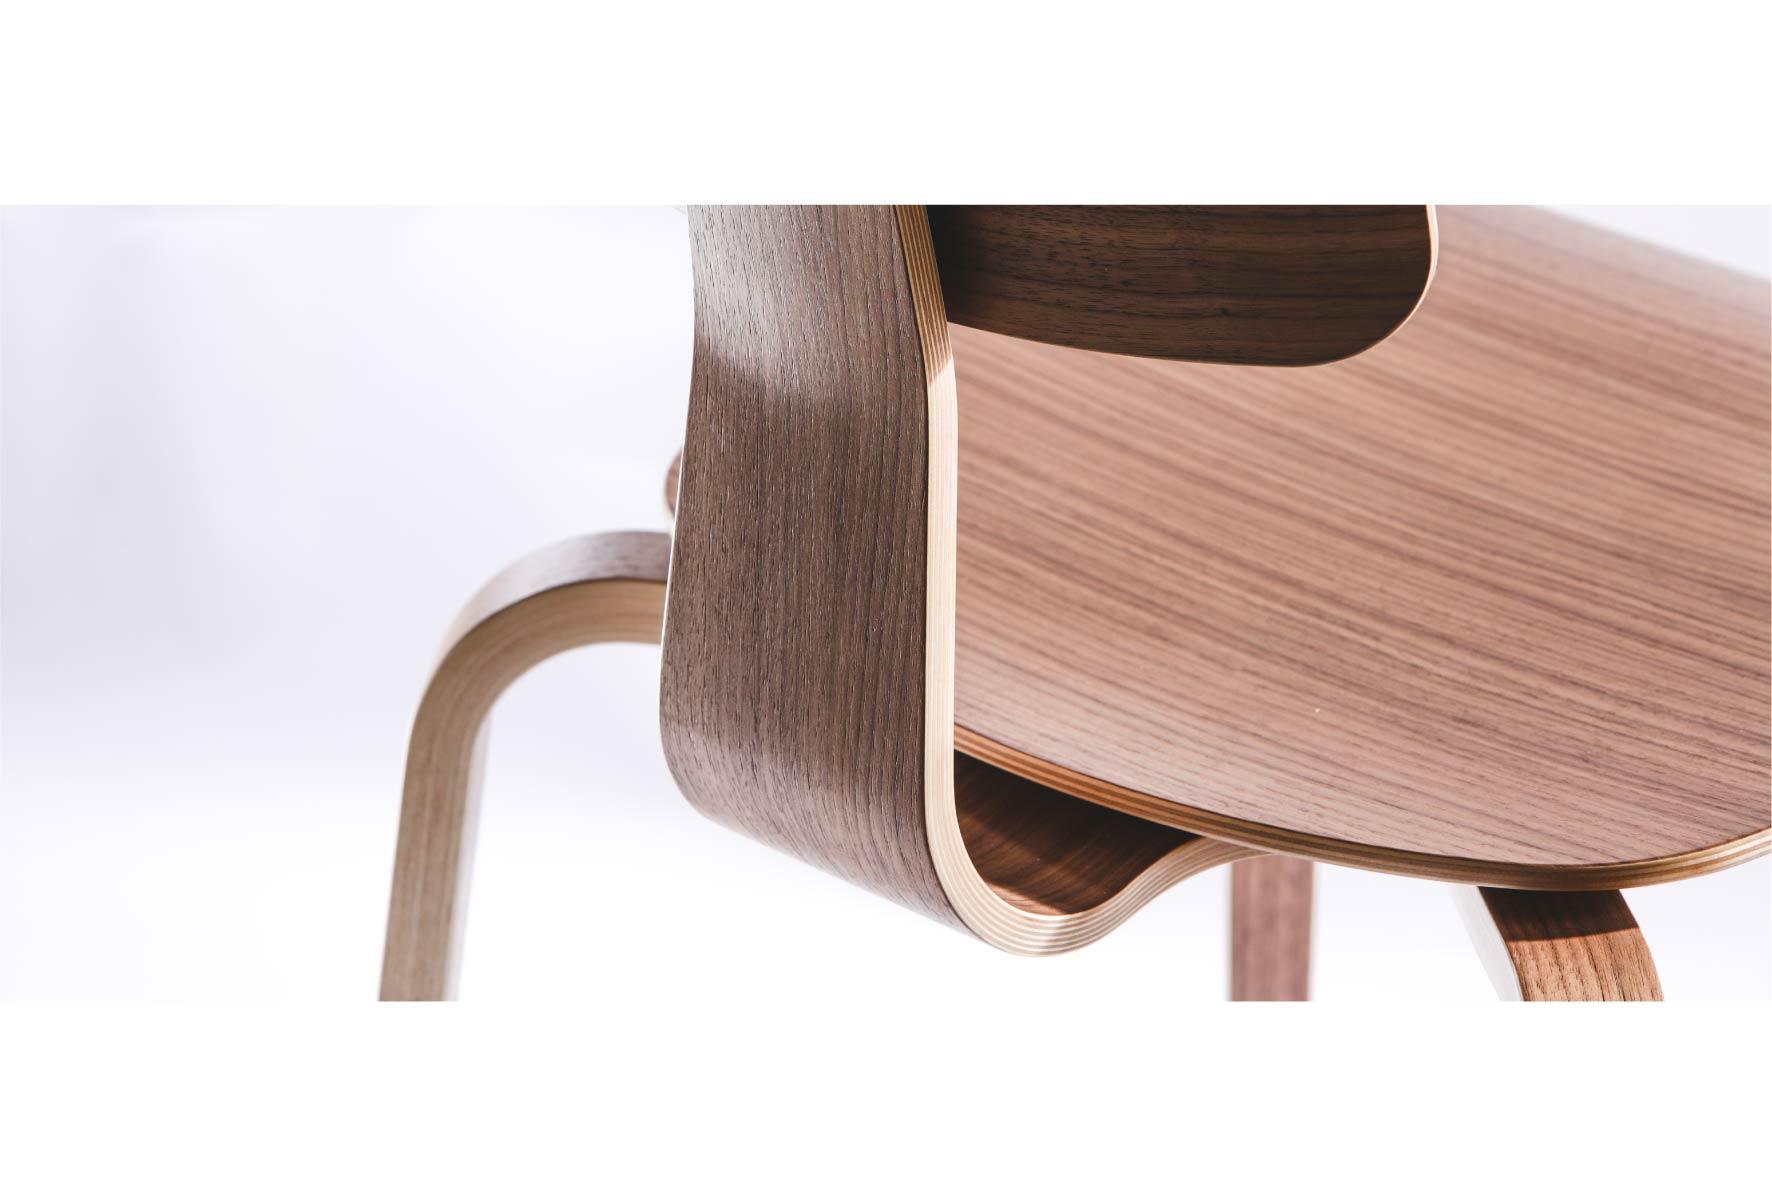 Dižozols bent wood design chairs (9)